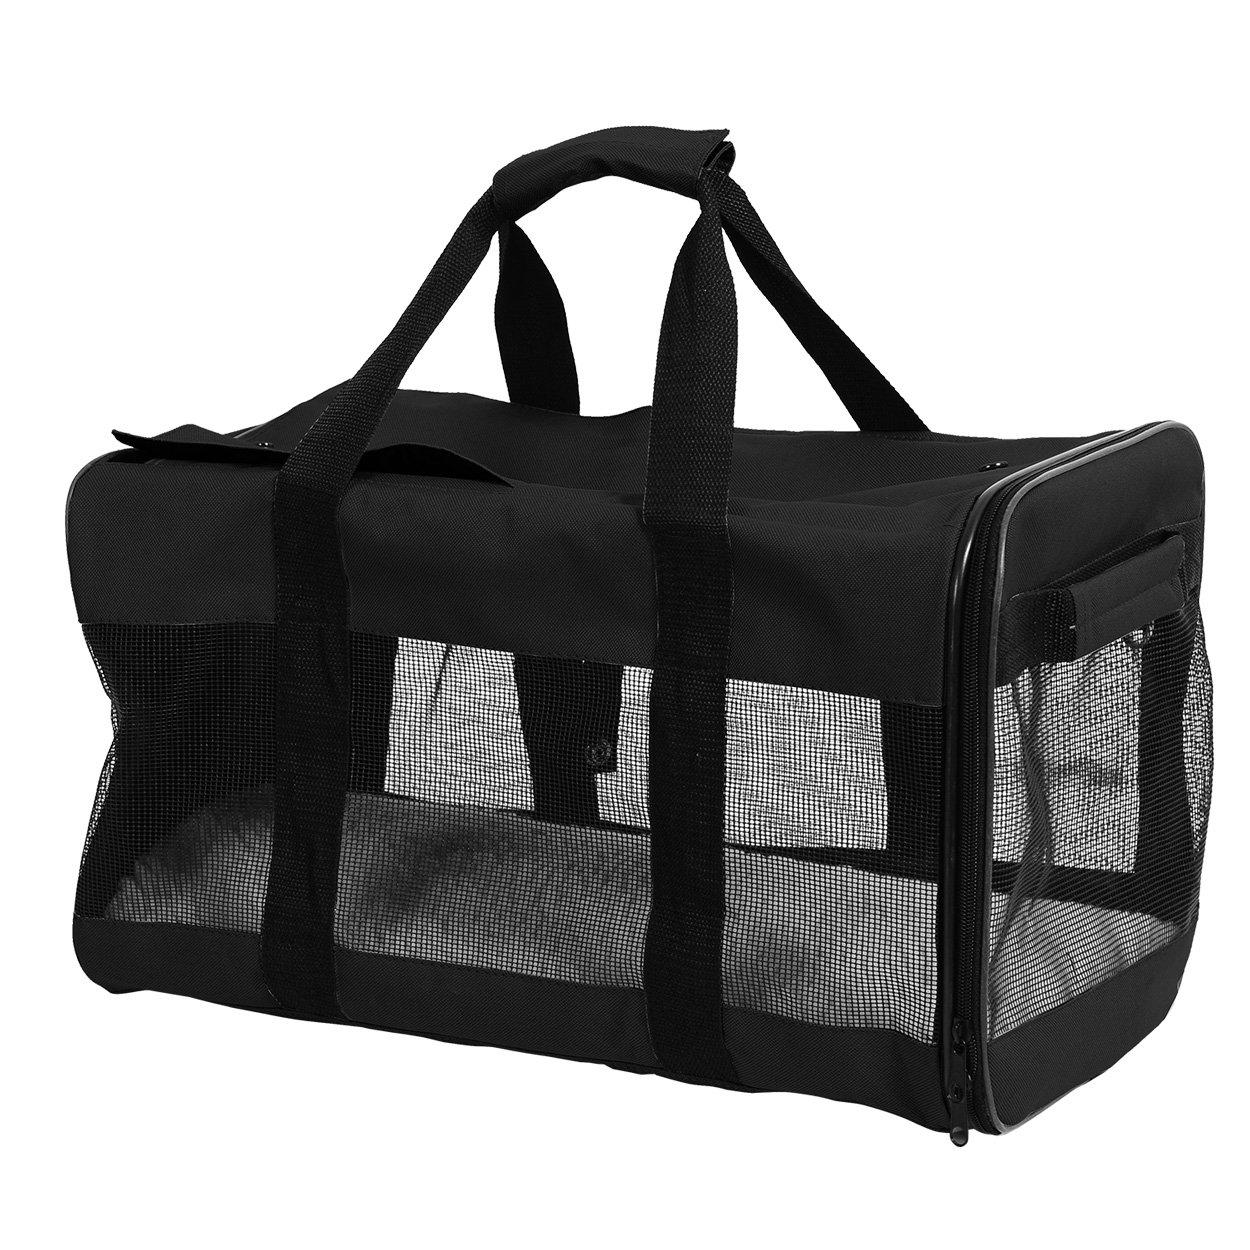 Animal Treasures 31121 Pet Travel Carrier, Black